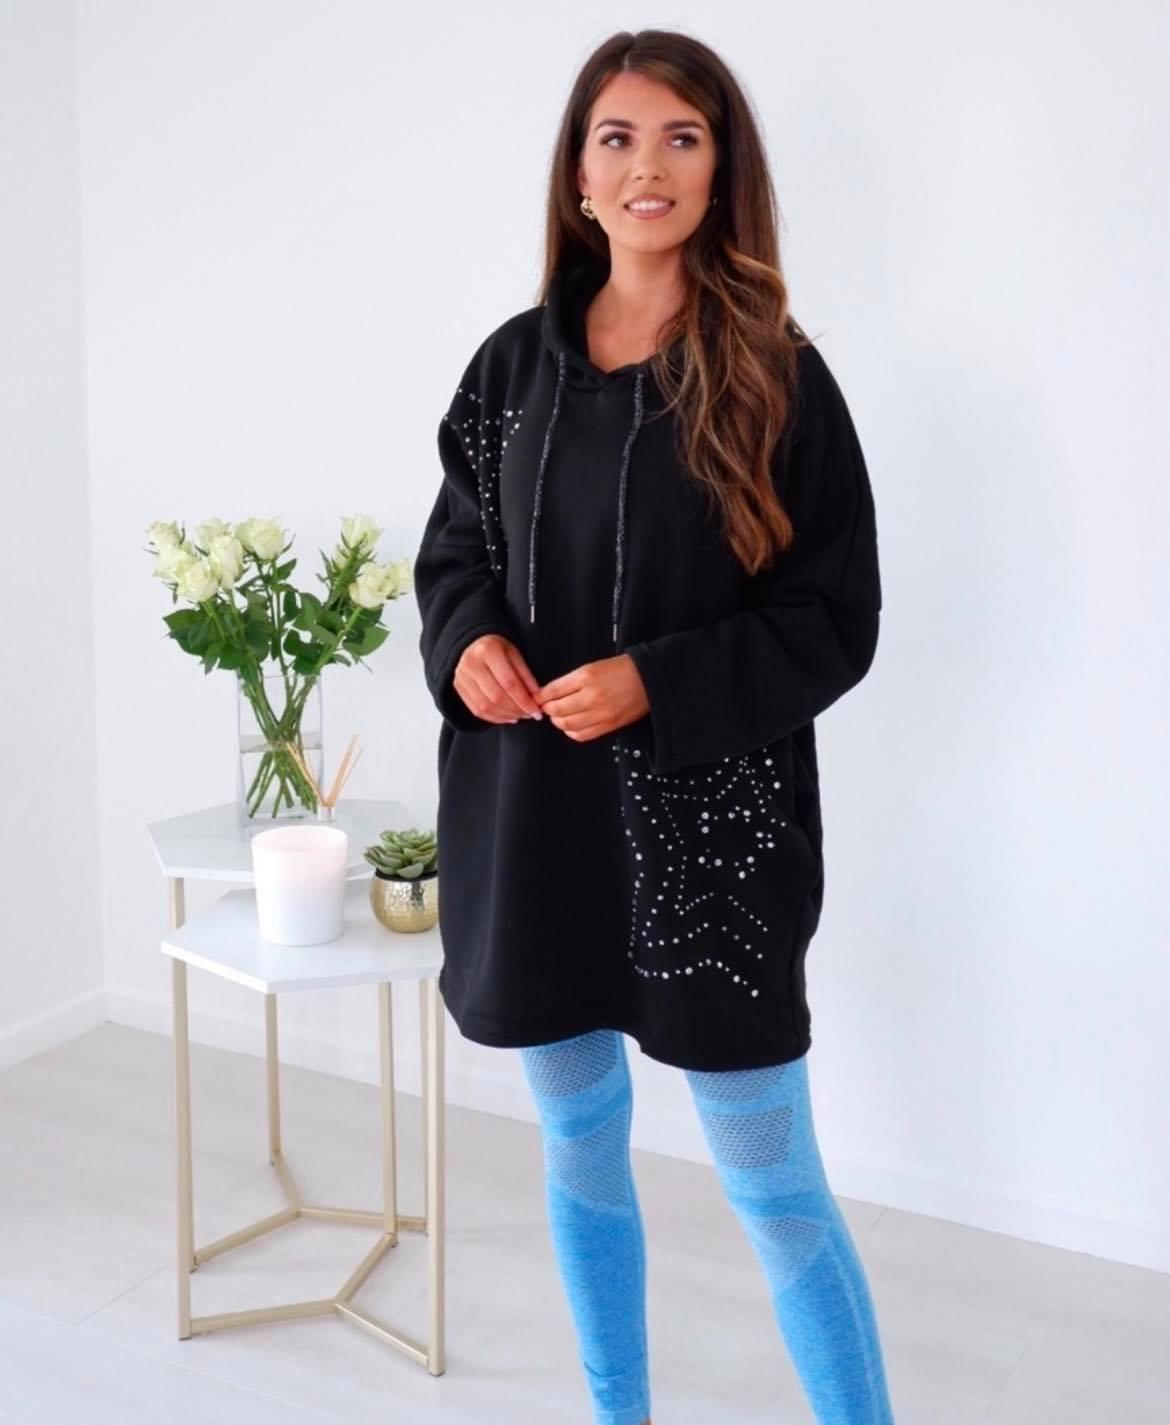 Luna – Star Diamante Studded Relaxed Fleece Sweater produ